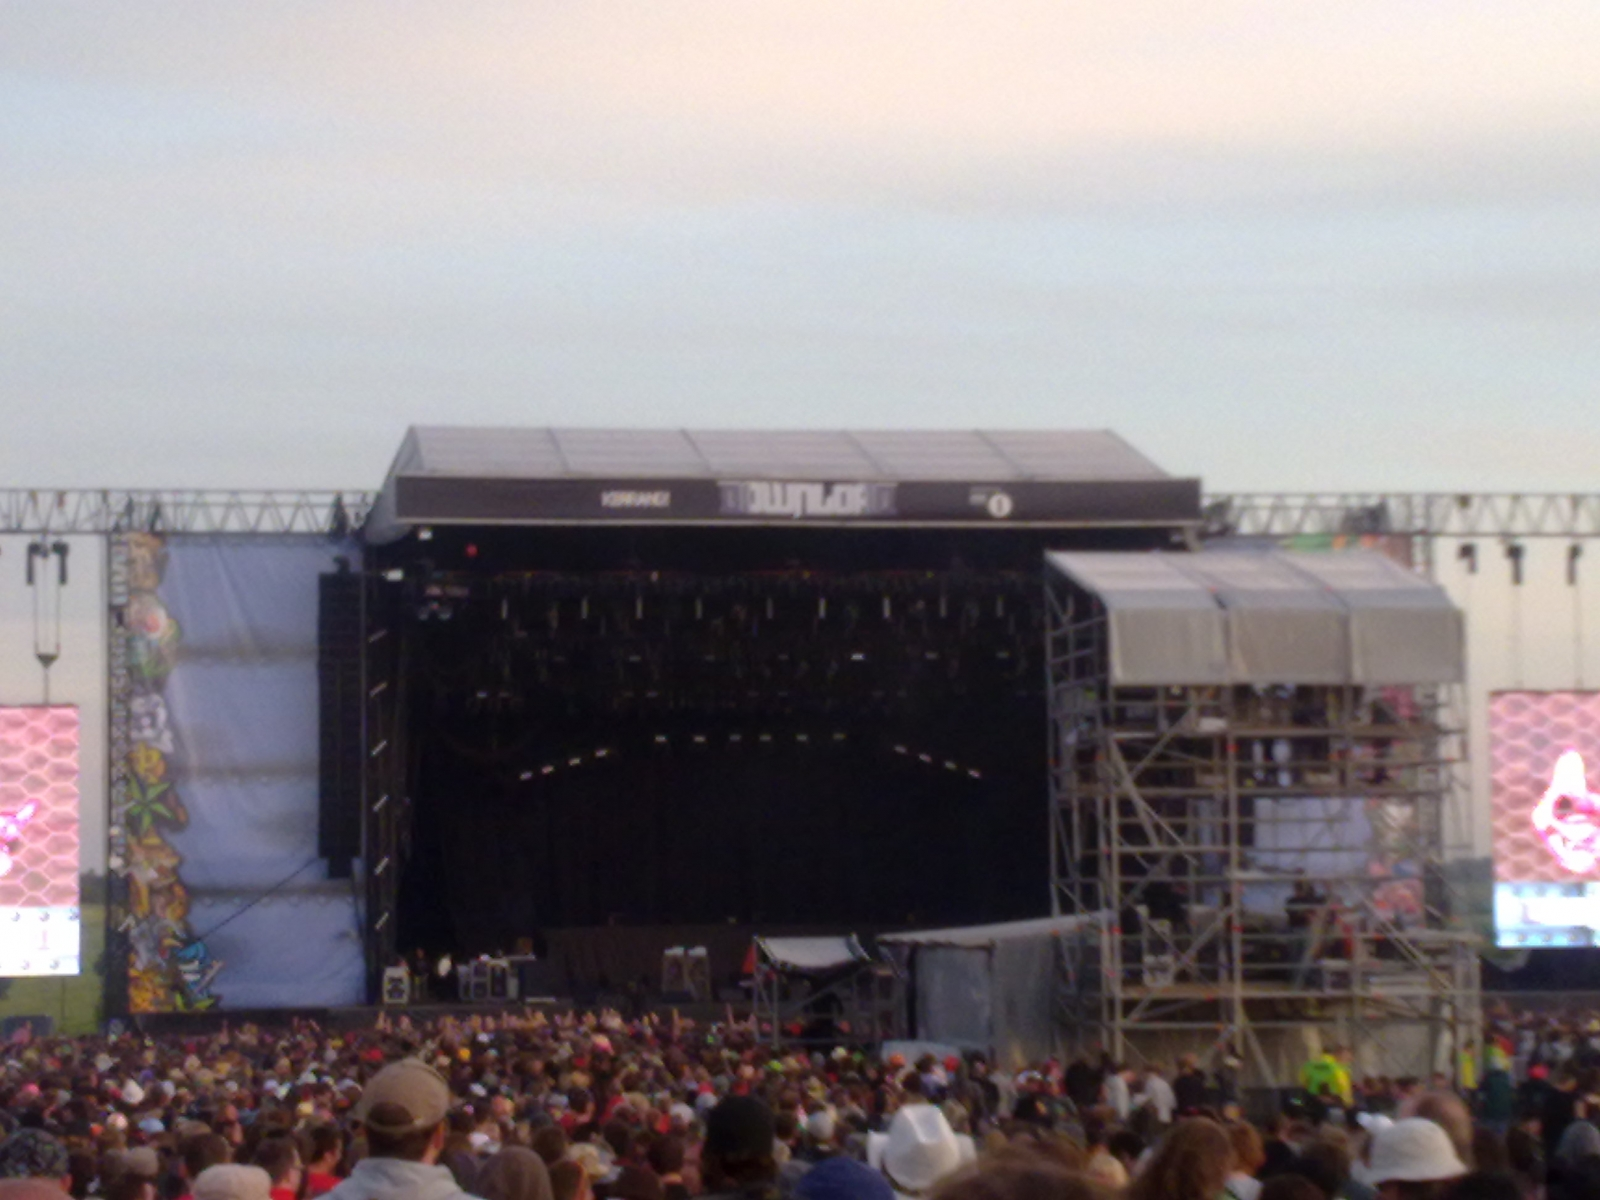 Download Festival 2010 - Experimental Engineering